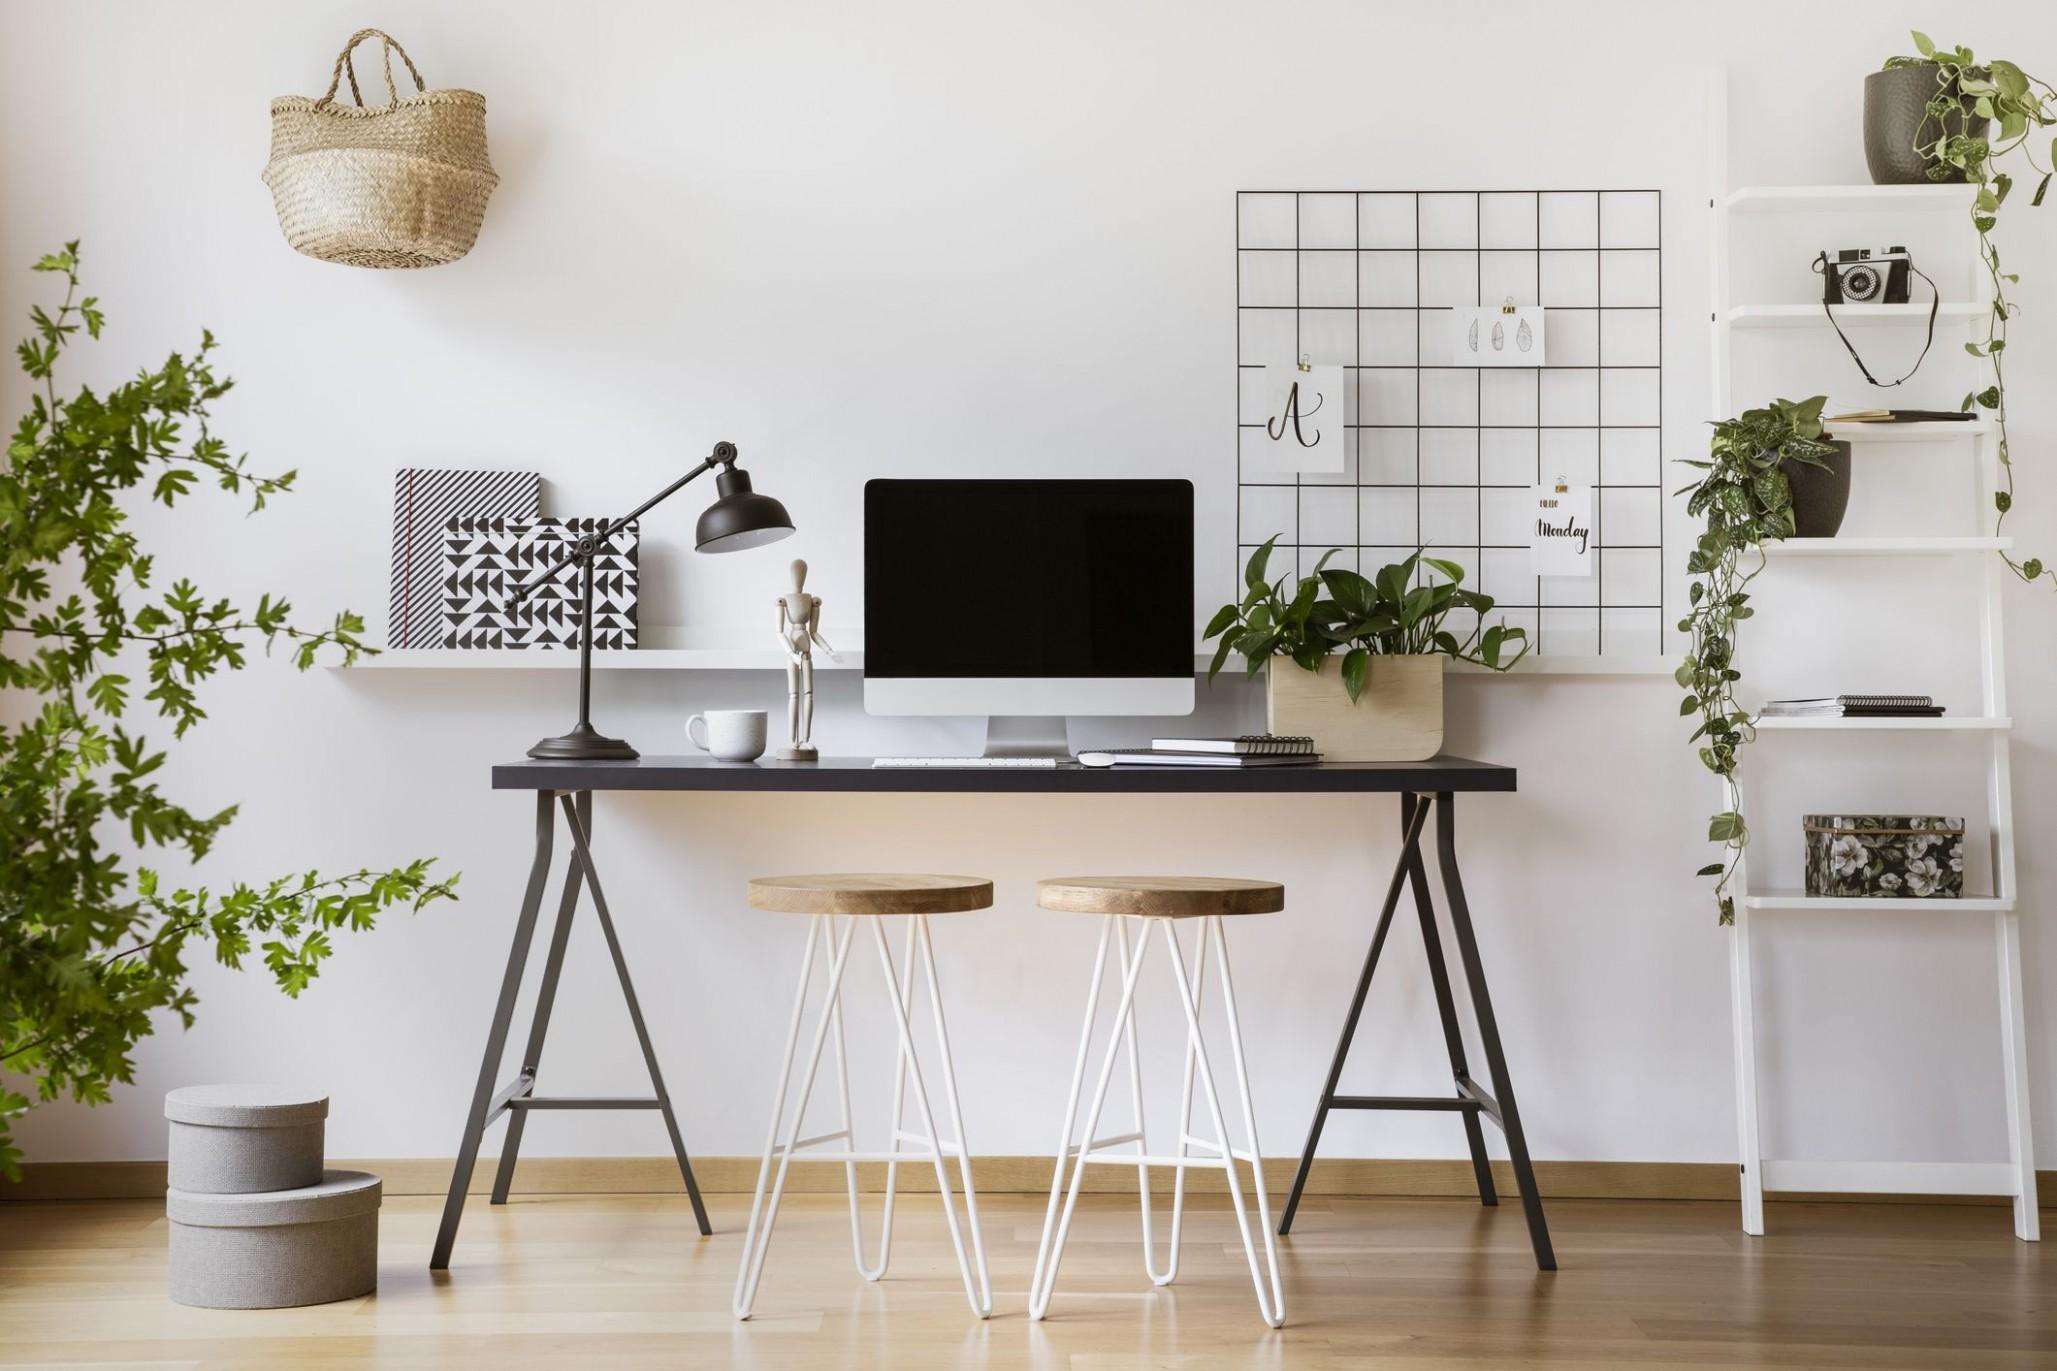 8 DIY Home Office Decor Ideas - Best Home Office Decor Projects - Home Office Ideas Budget